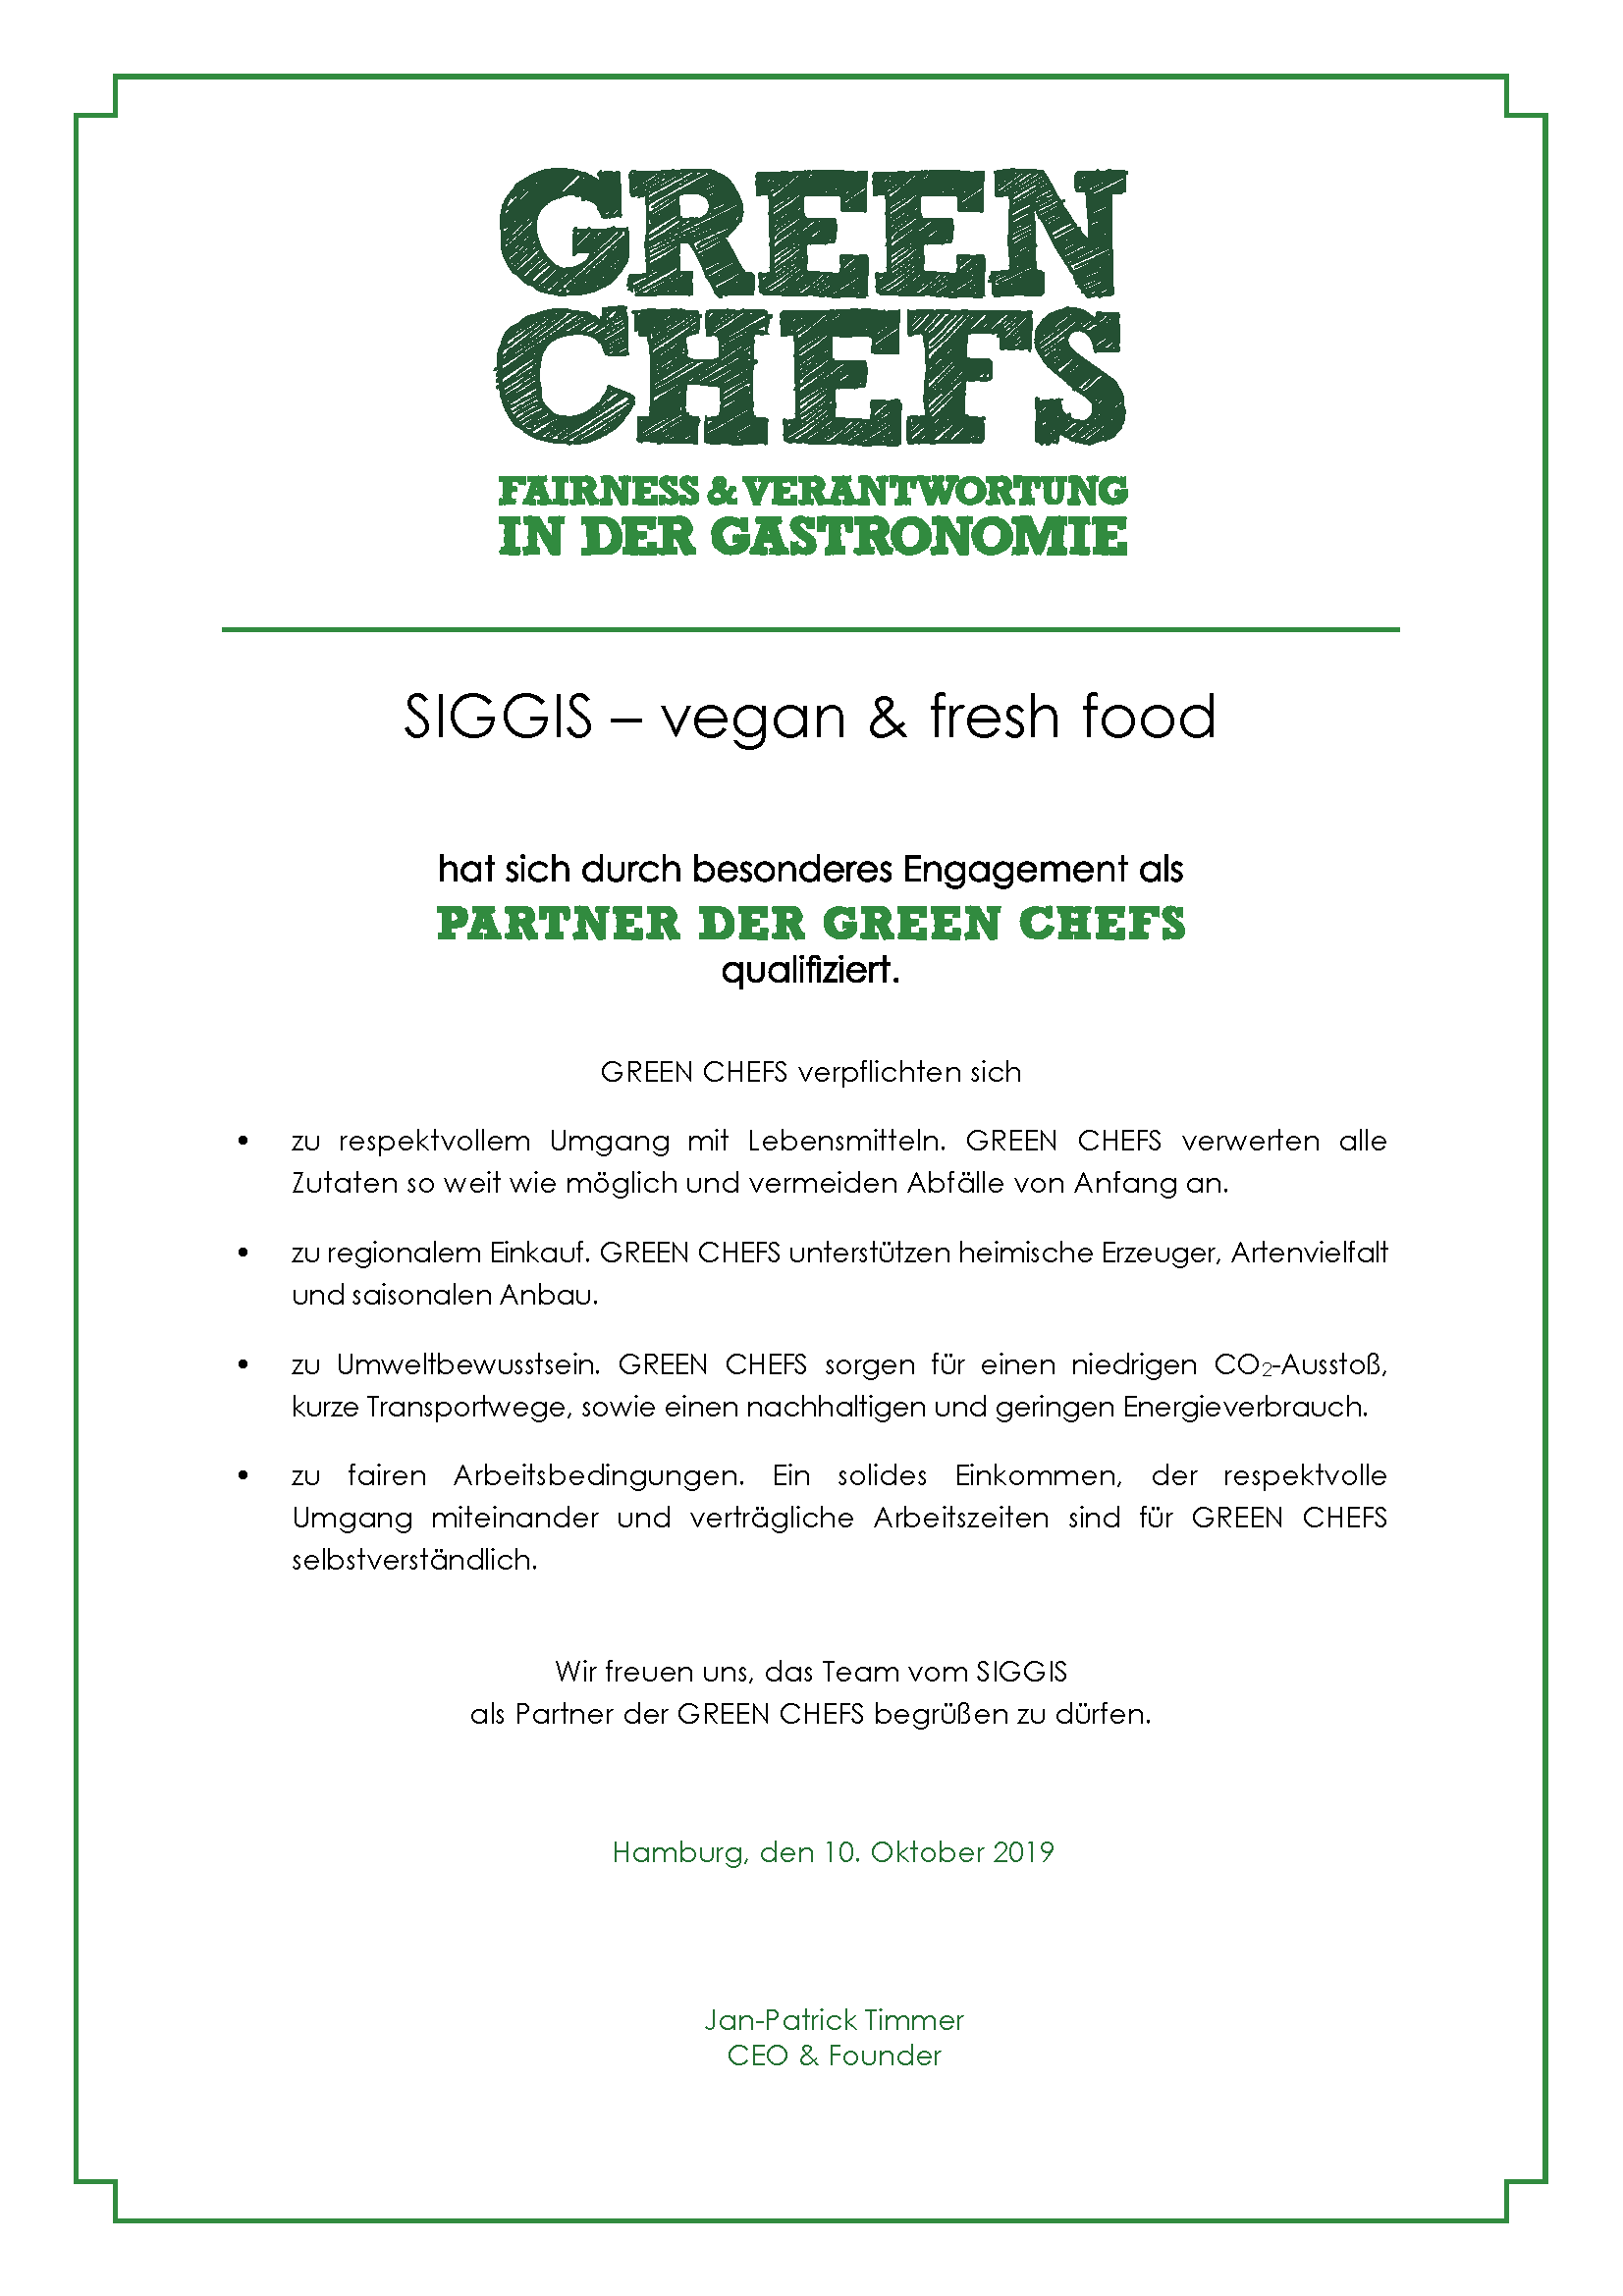 GREEN_CHEFS_Urkunde Siggis